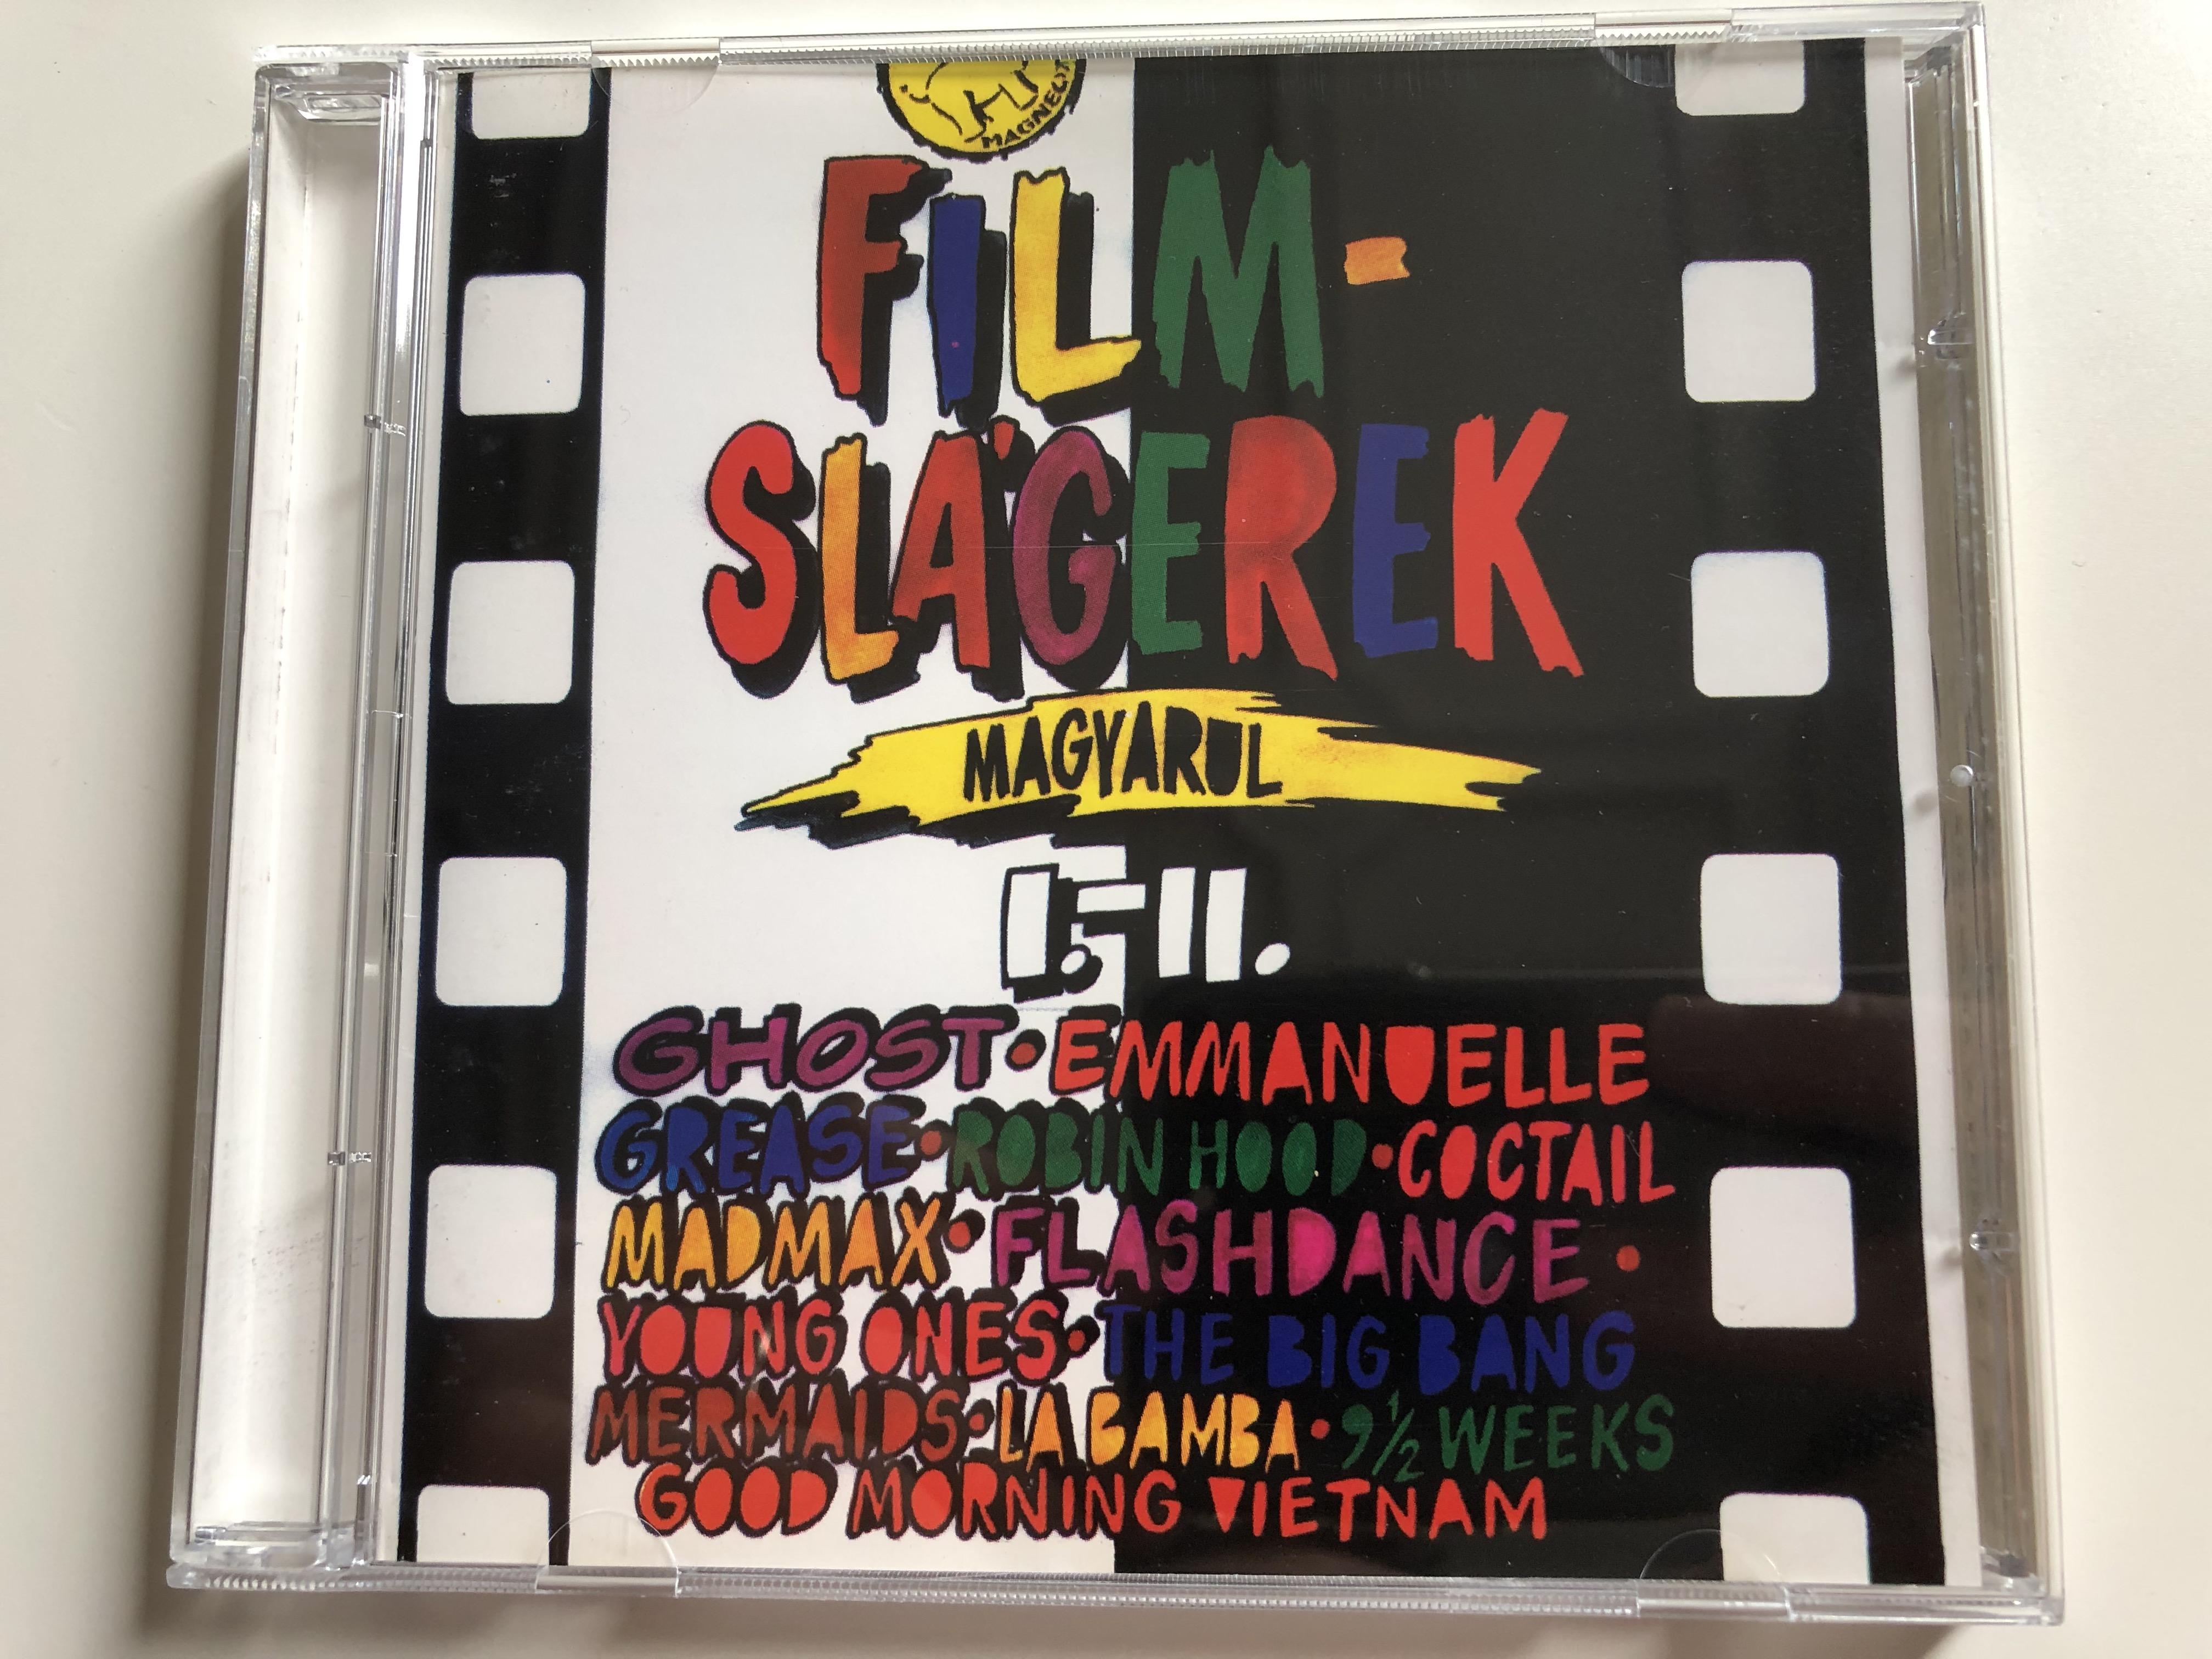 filmsl-gerek-magyarul-i.-ii.-ghost-emmanuelle-grease-robin-hood-coctail-madmax-flashdance-young-ones-the-big-bang-mermaids-la-bamba-9-12-weeks-good-morning-vietnam-new-tone-audio-cd-1-.jpg